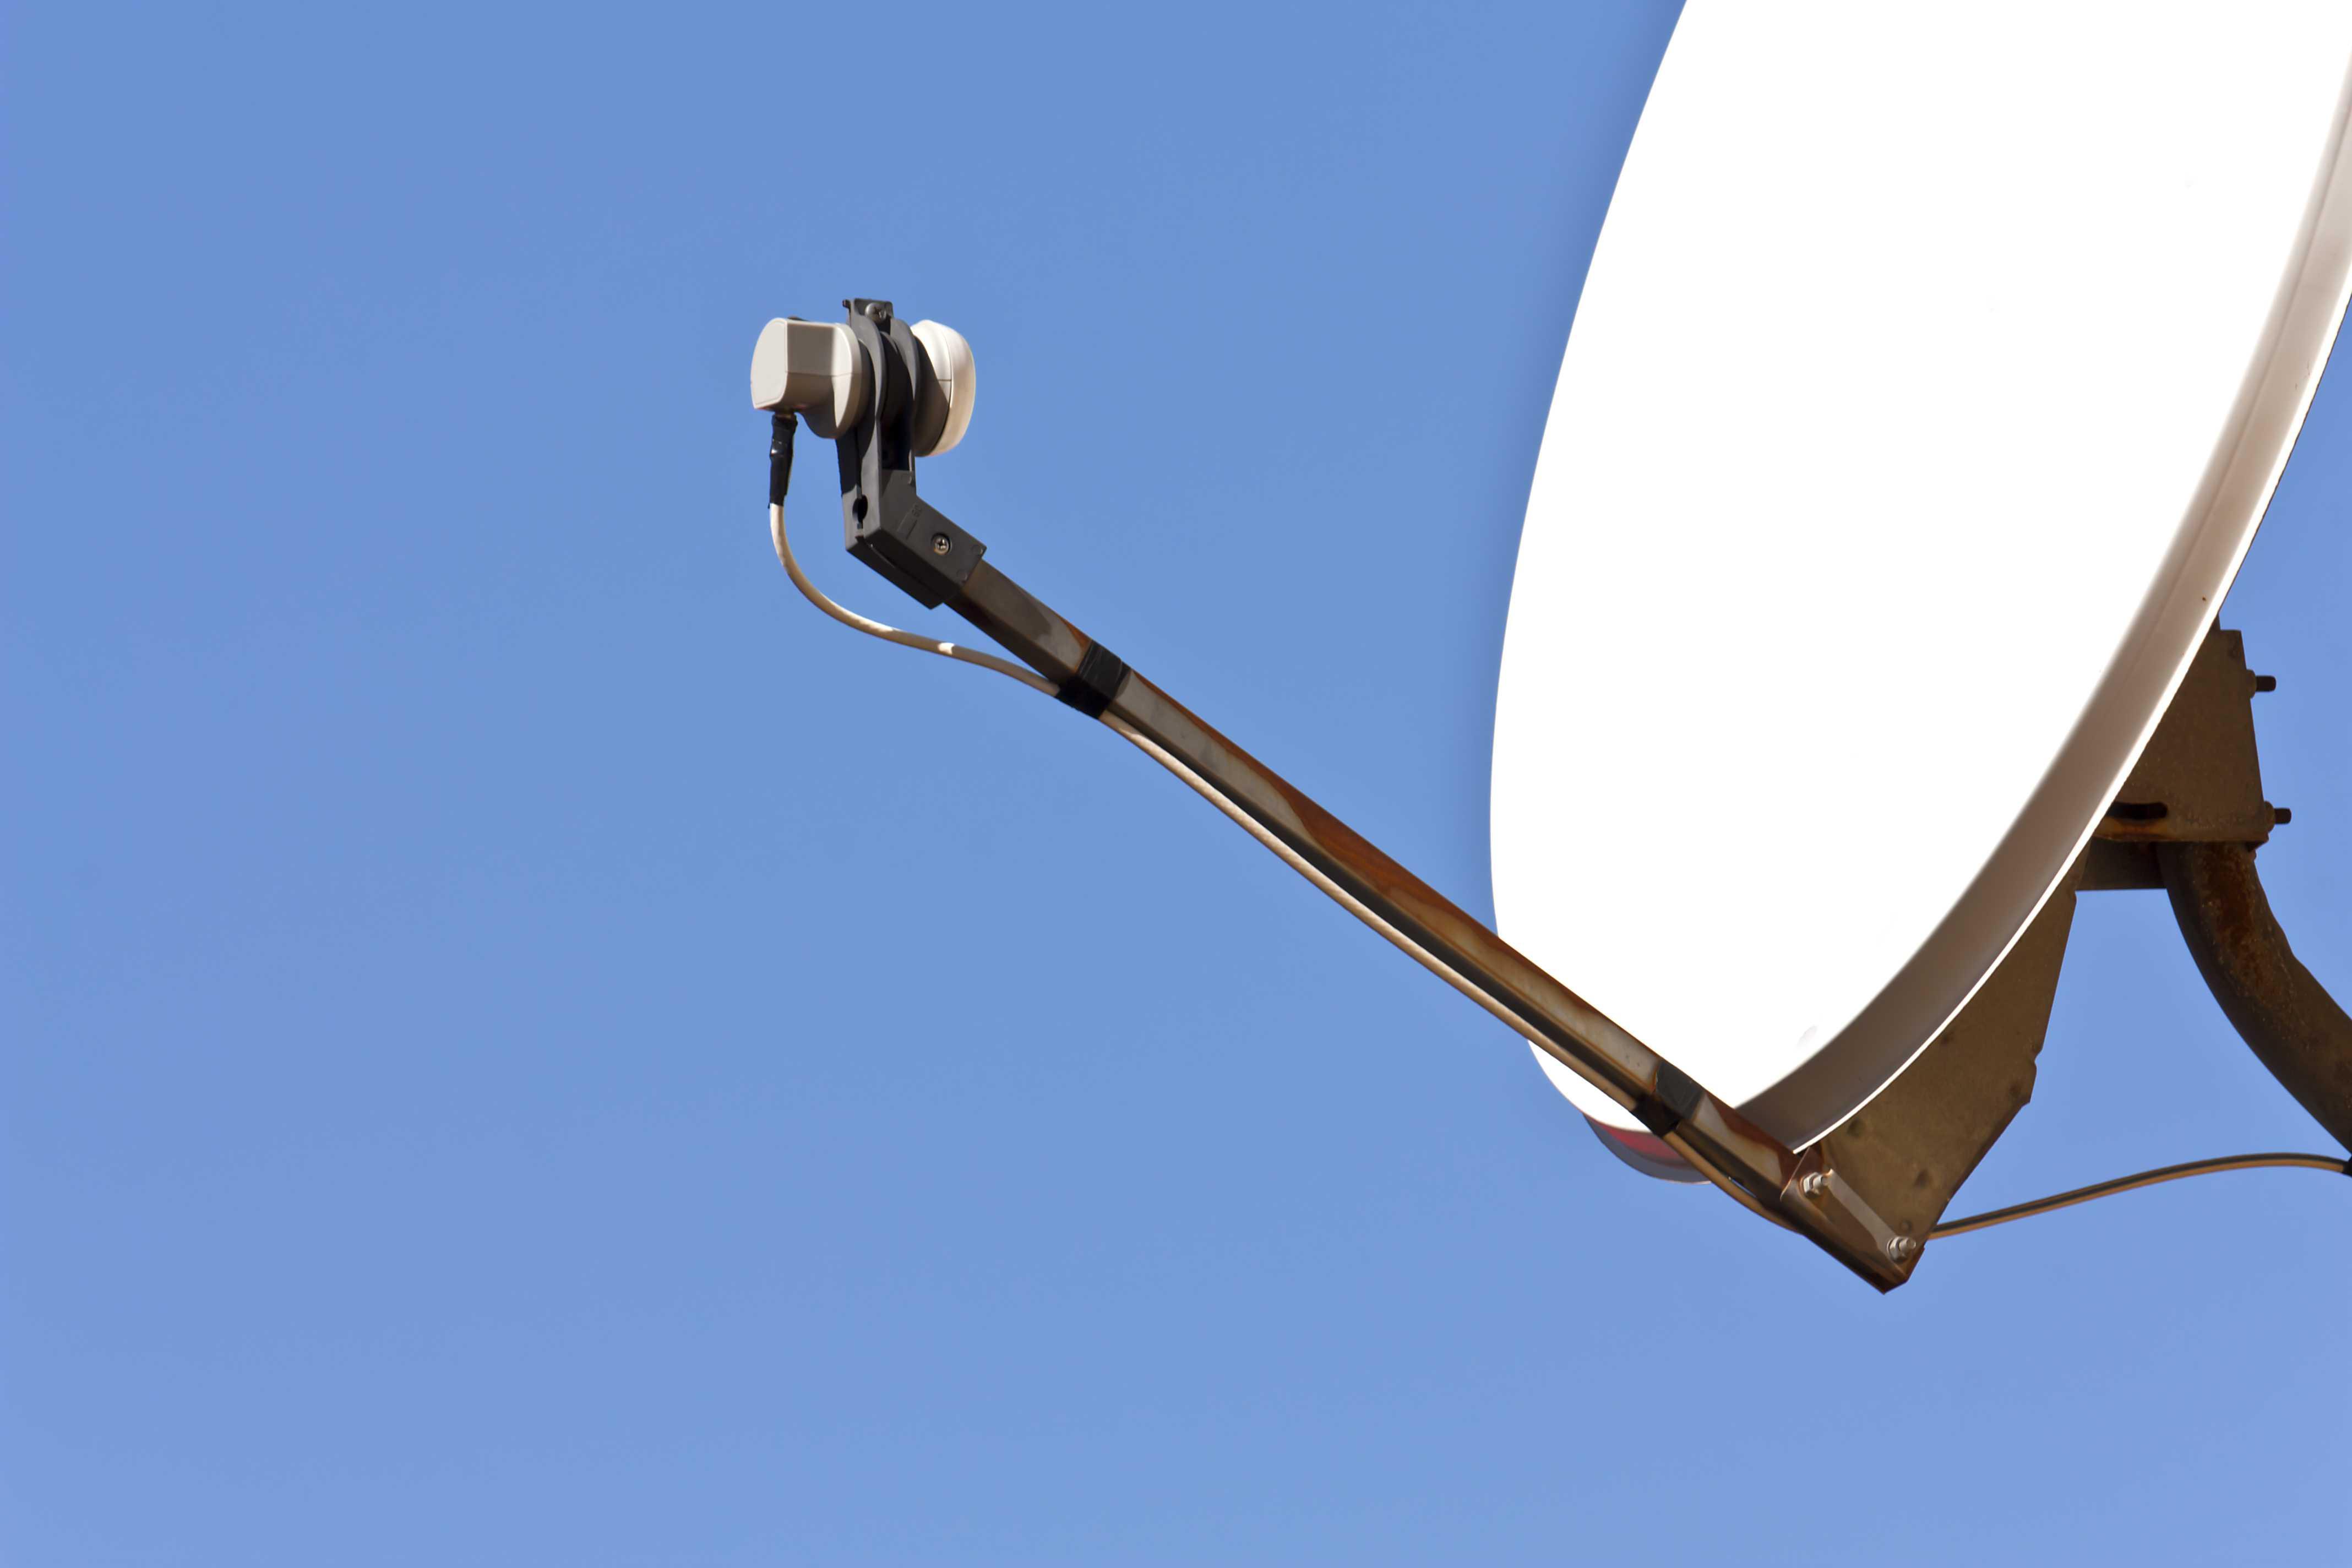 A home satellite dish